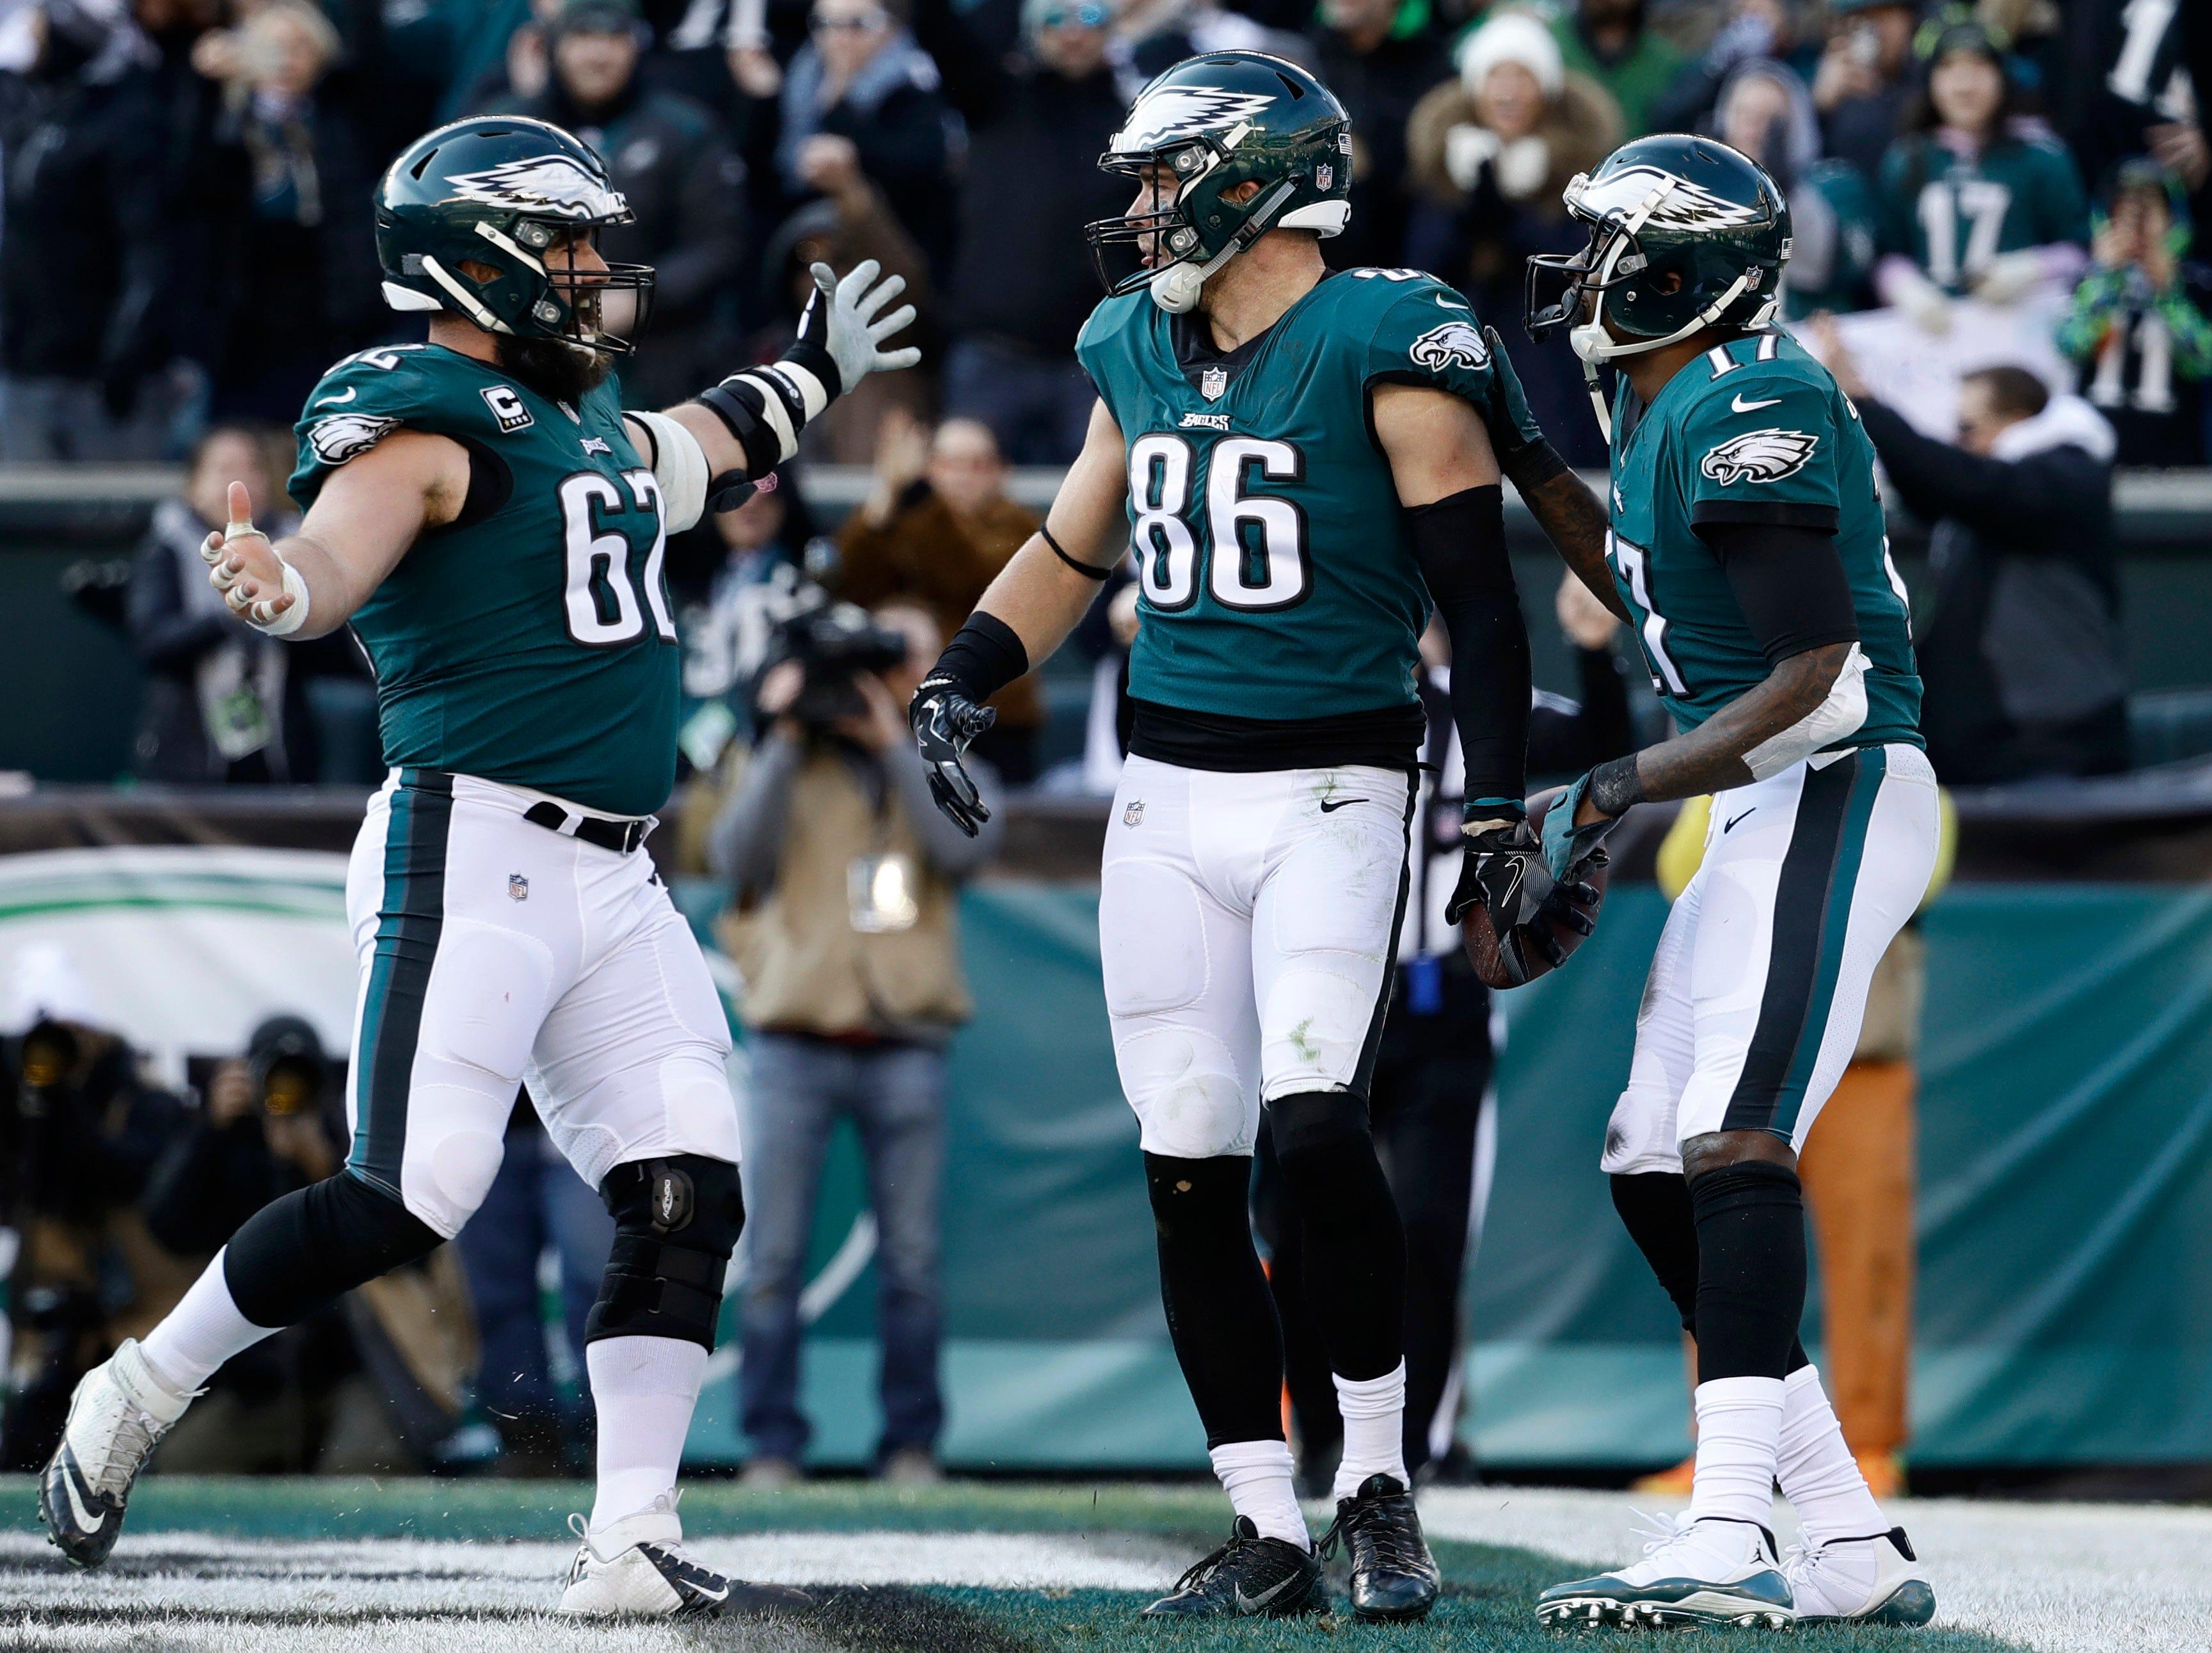 Philadelphia Eagles' Zach Ertz (86) celebrates with Jason Kelce (62) and Alshon Jeffery (17) after a touchdown during the first half of an NFL football game against the Houston Texans, Sunday, Dec. 23, 2018, in Philadelphia. (AP Photo/Matt Rourke)